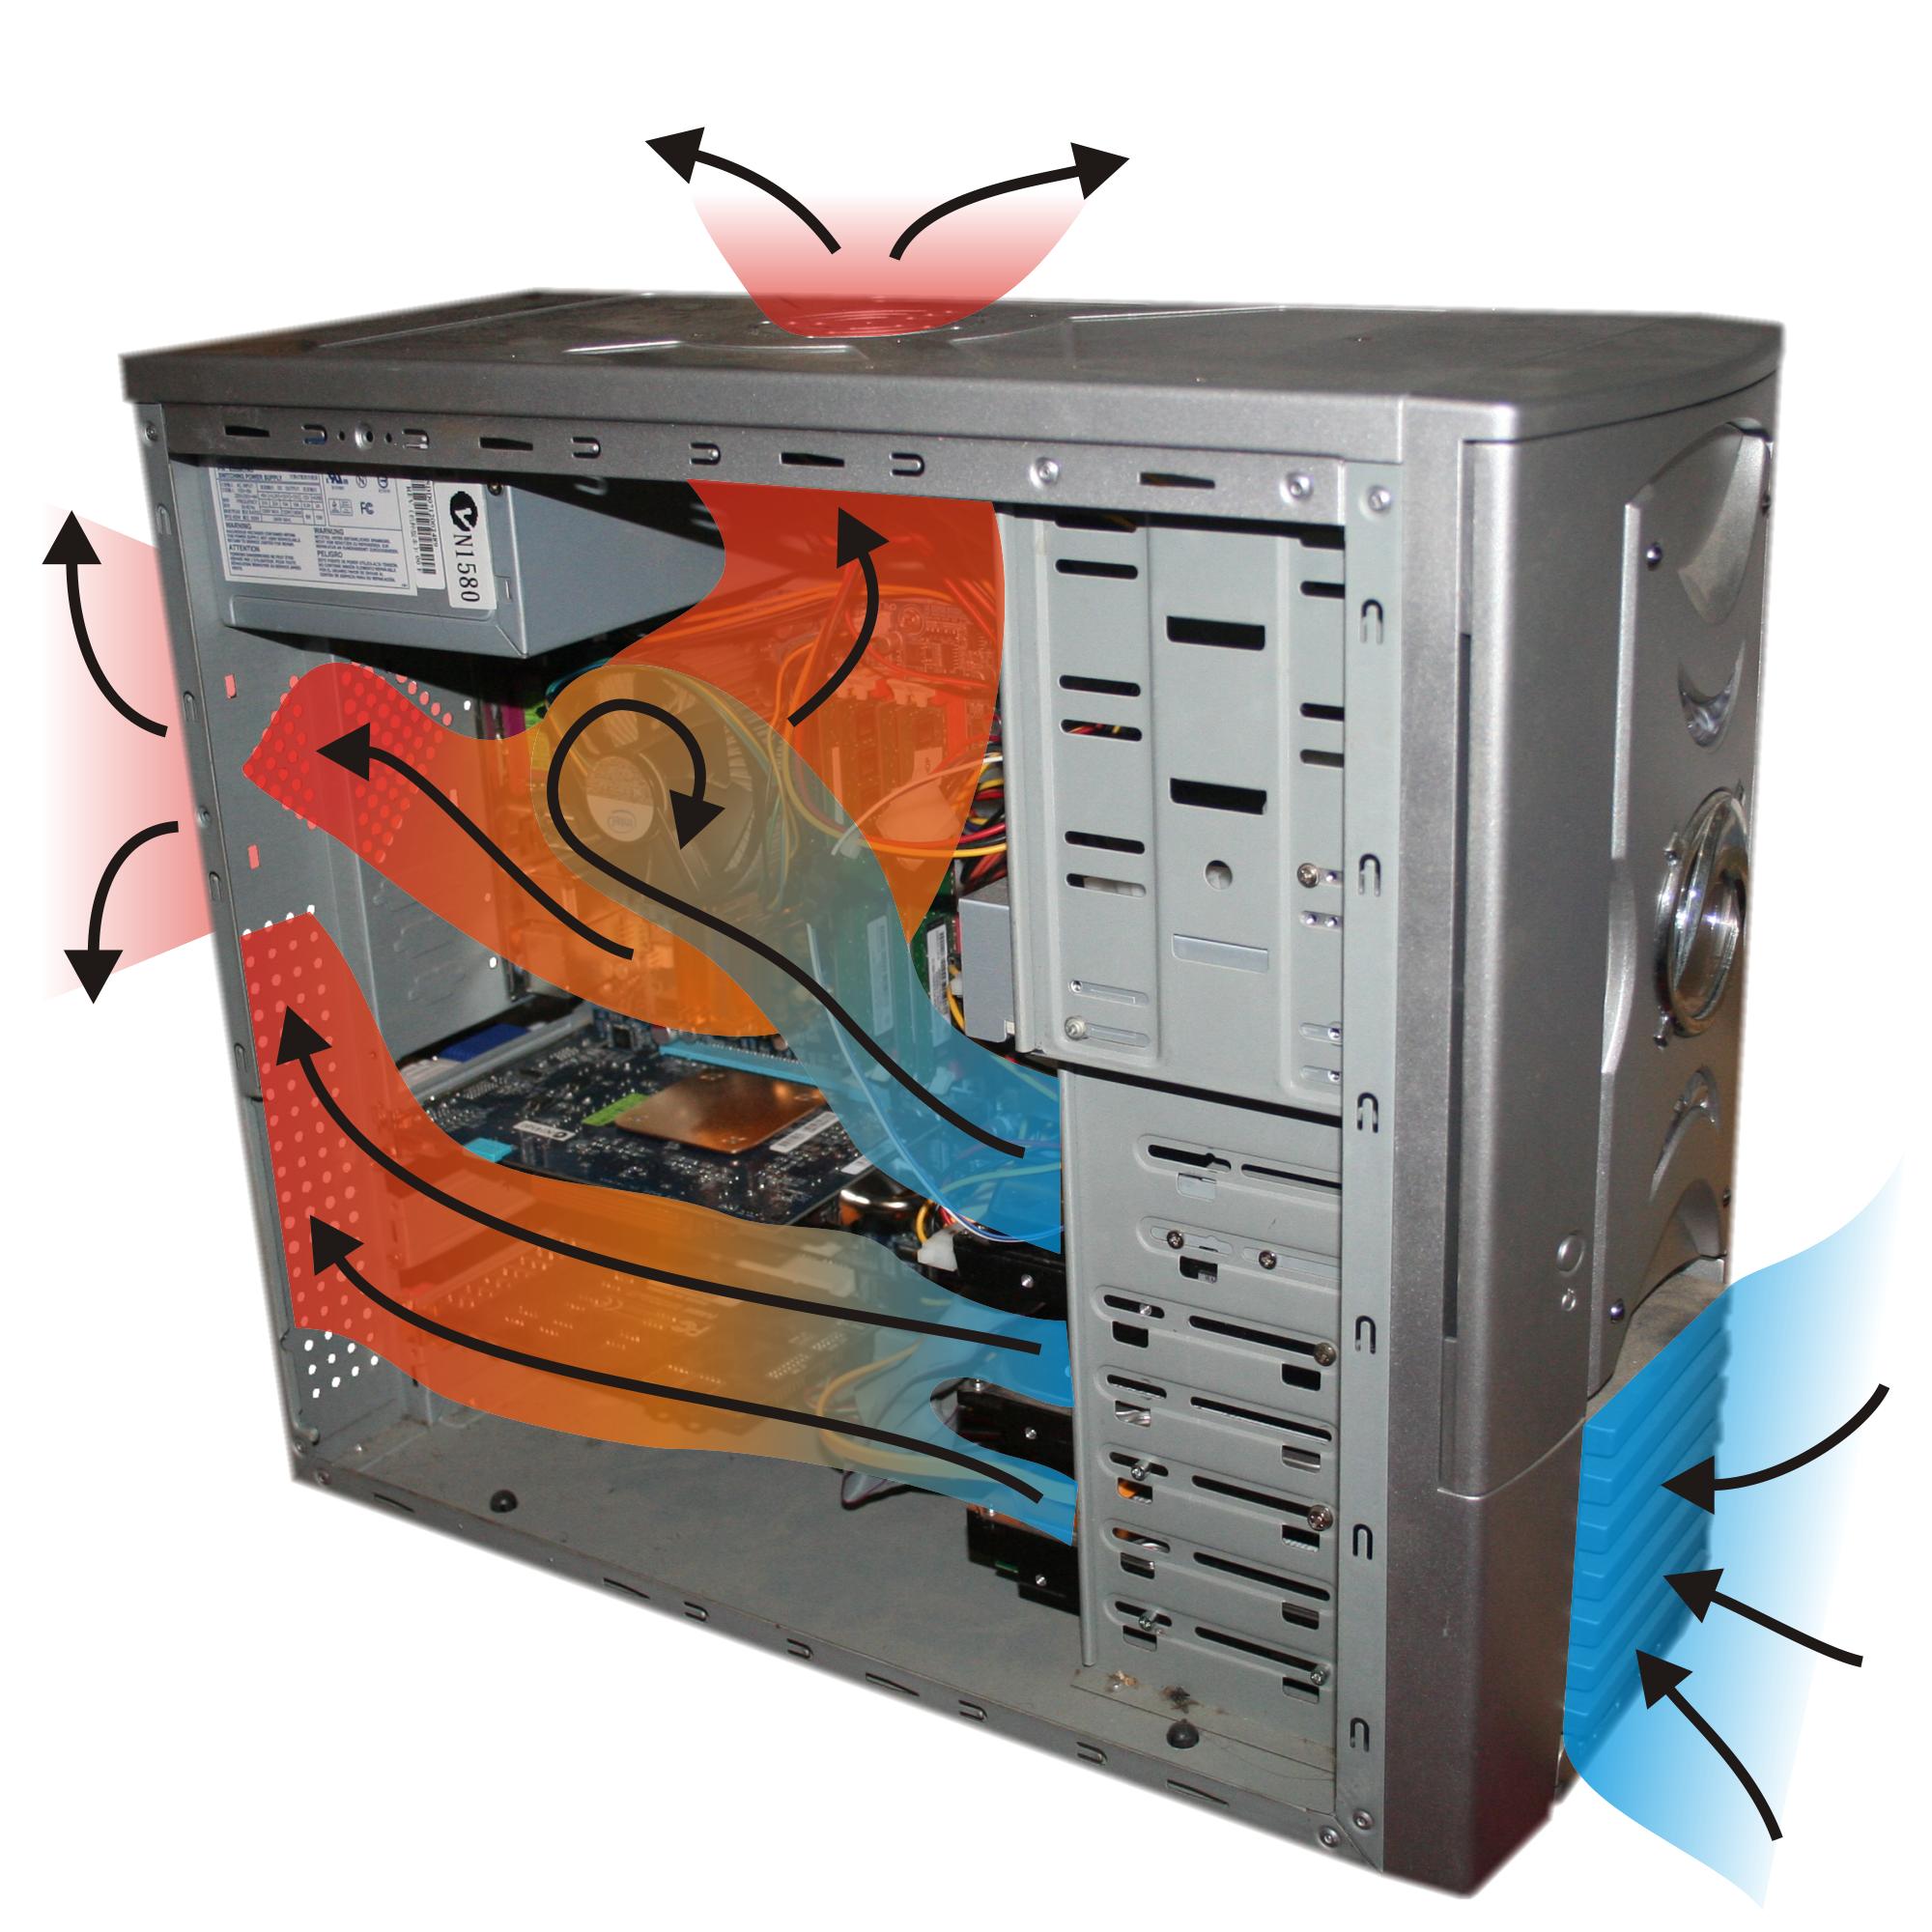 How To Modify A puter Case Make Custom Modded Desktop Tower